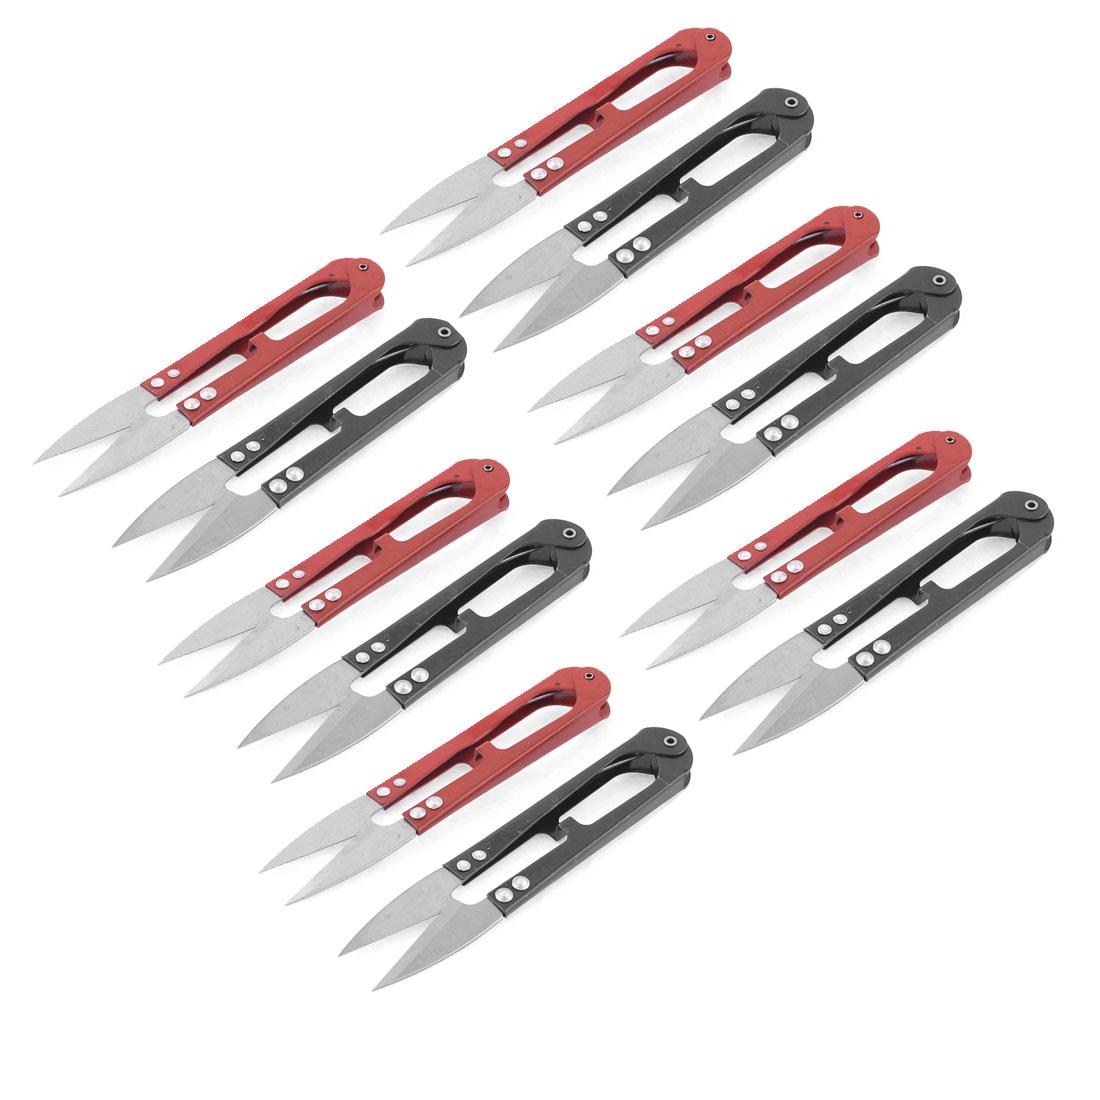 12 Pcs Red Black Handy Sharp Mini Thrum Yarn Scissors for Cross Stitch